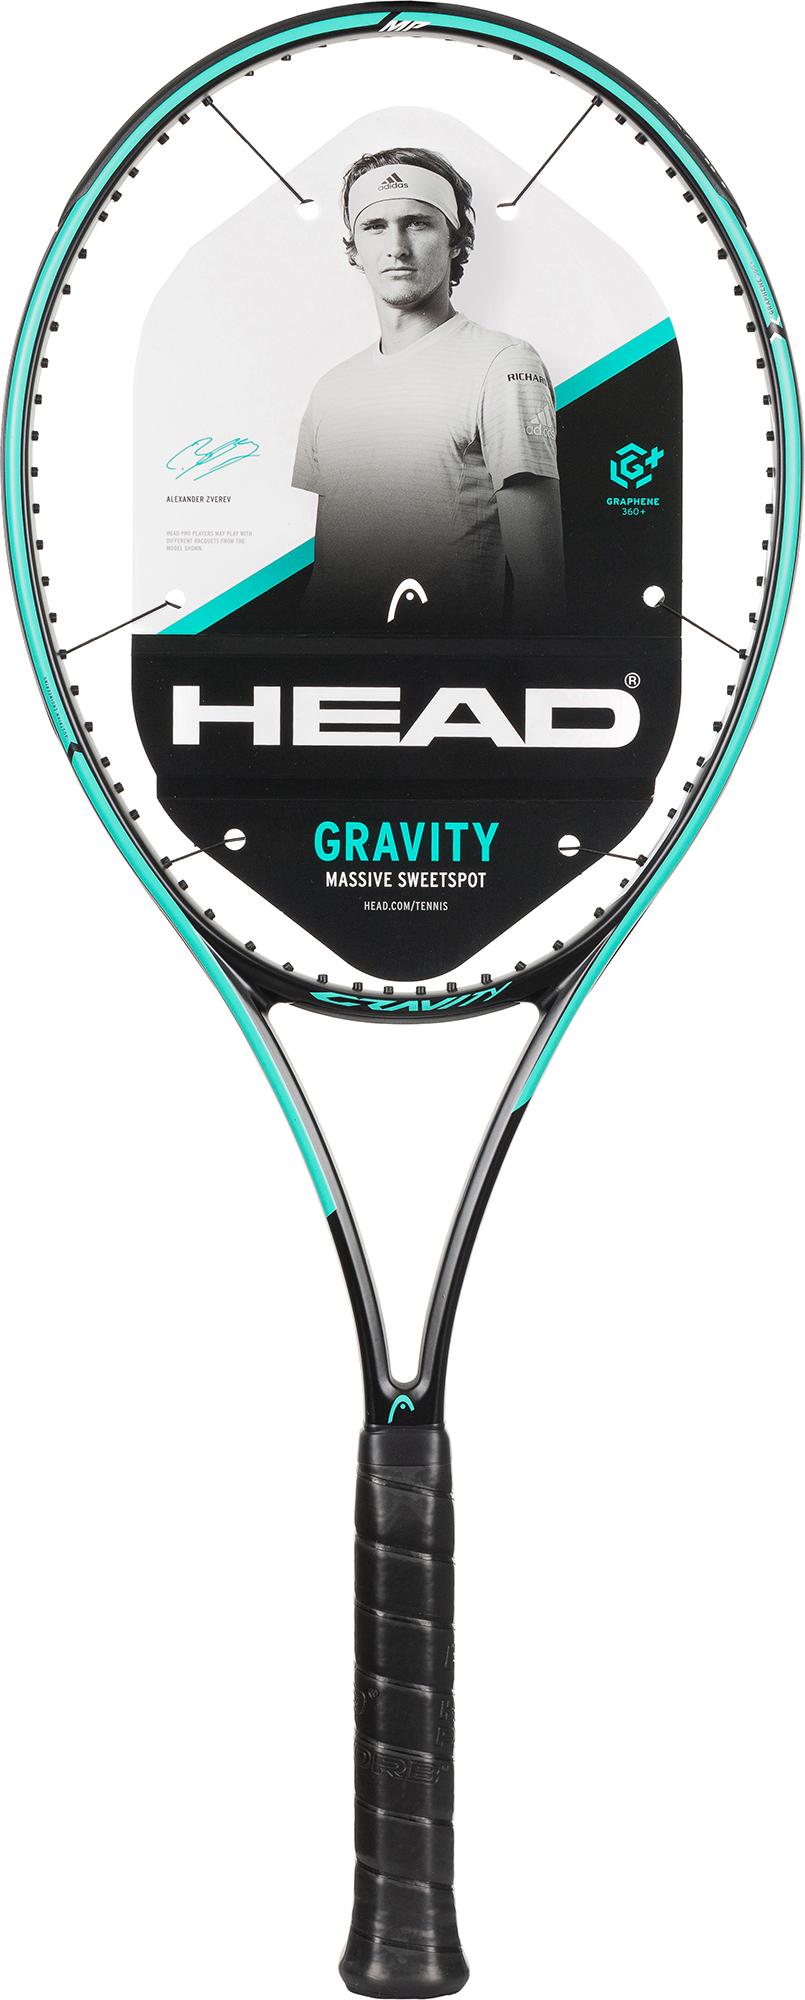 Head Ракетка для большого тенниса Head Graphene 360+ Gravity MP head ракетка для большого тенниса head graphene 360 speed lite 27